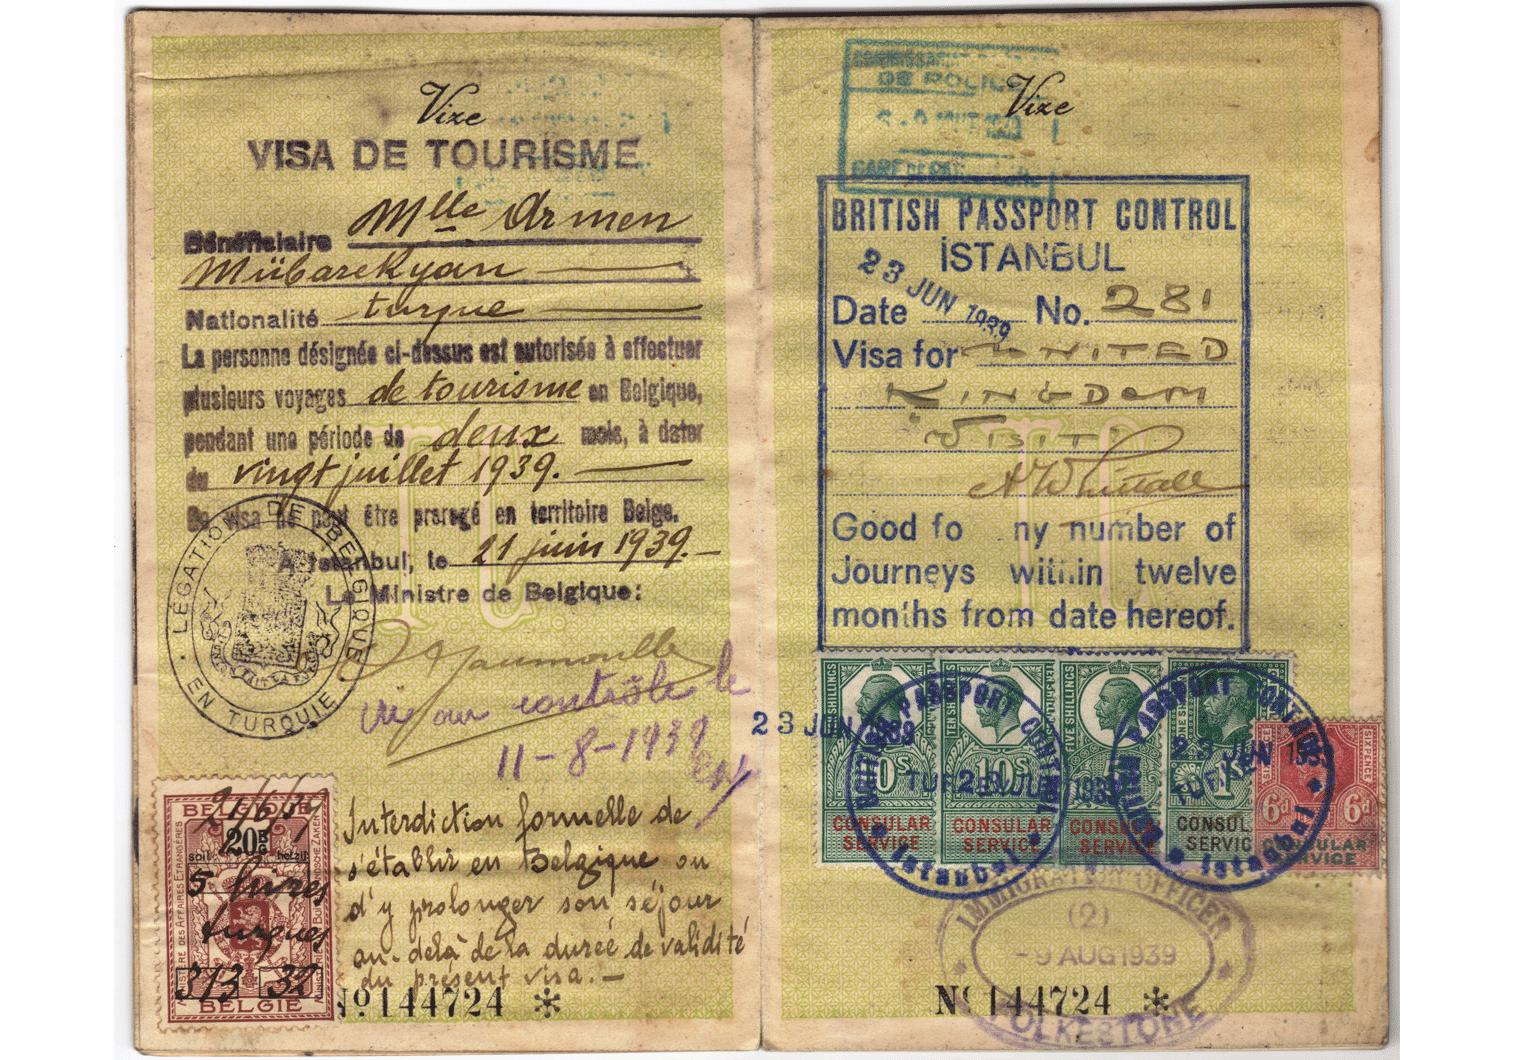 WW2 Arthur Whittall visa.